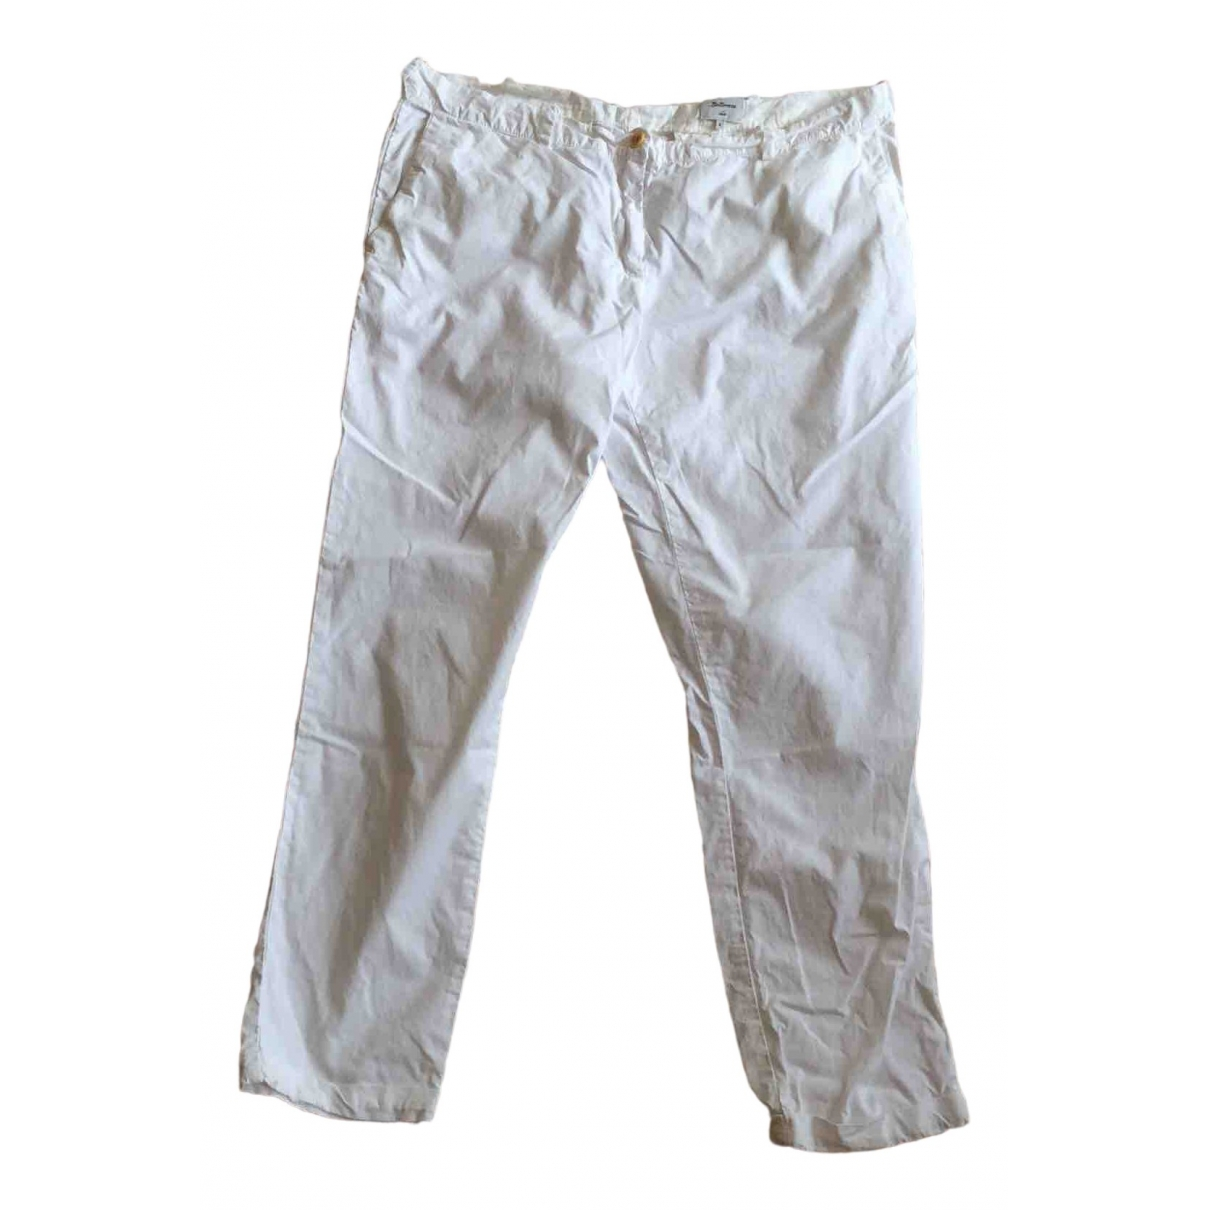 Bellerose \N White Cotton Trousers for Women 4 0-5